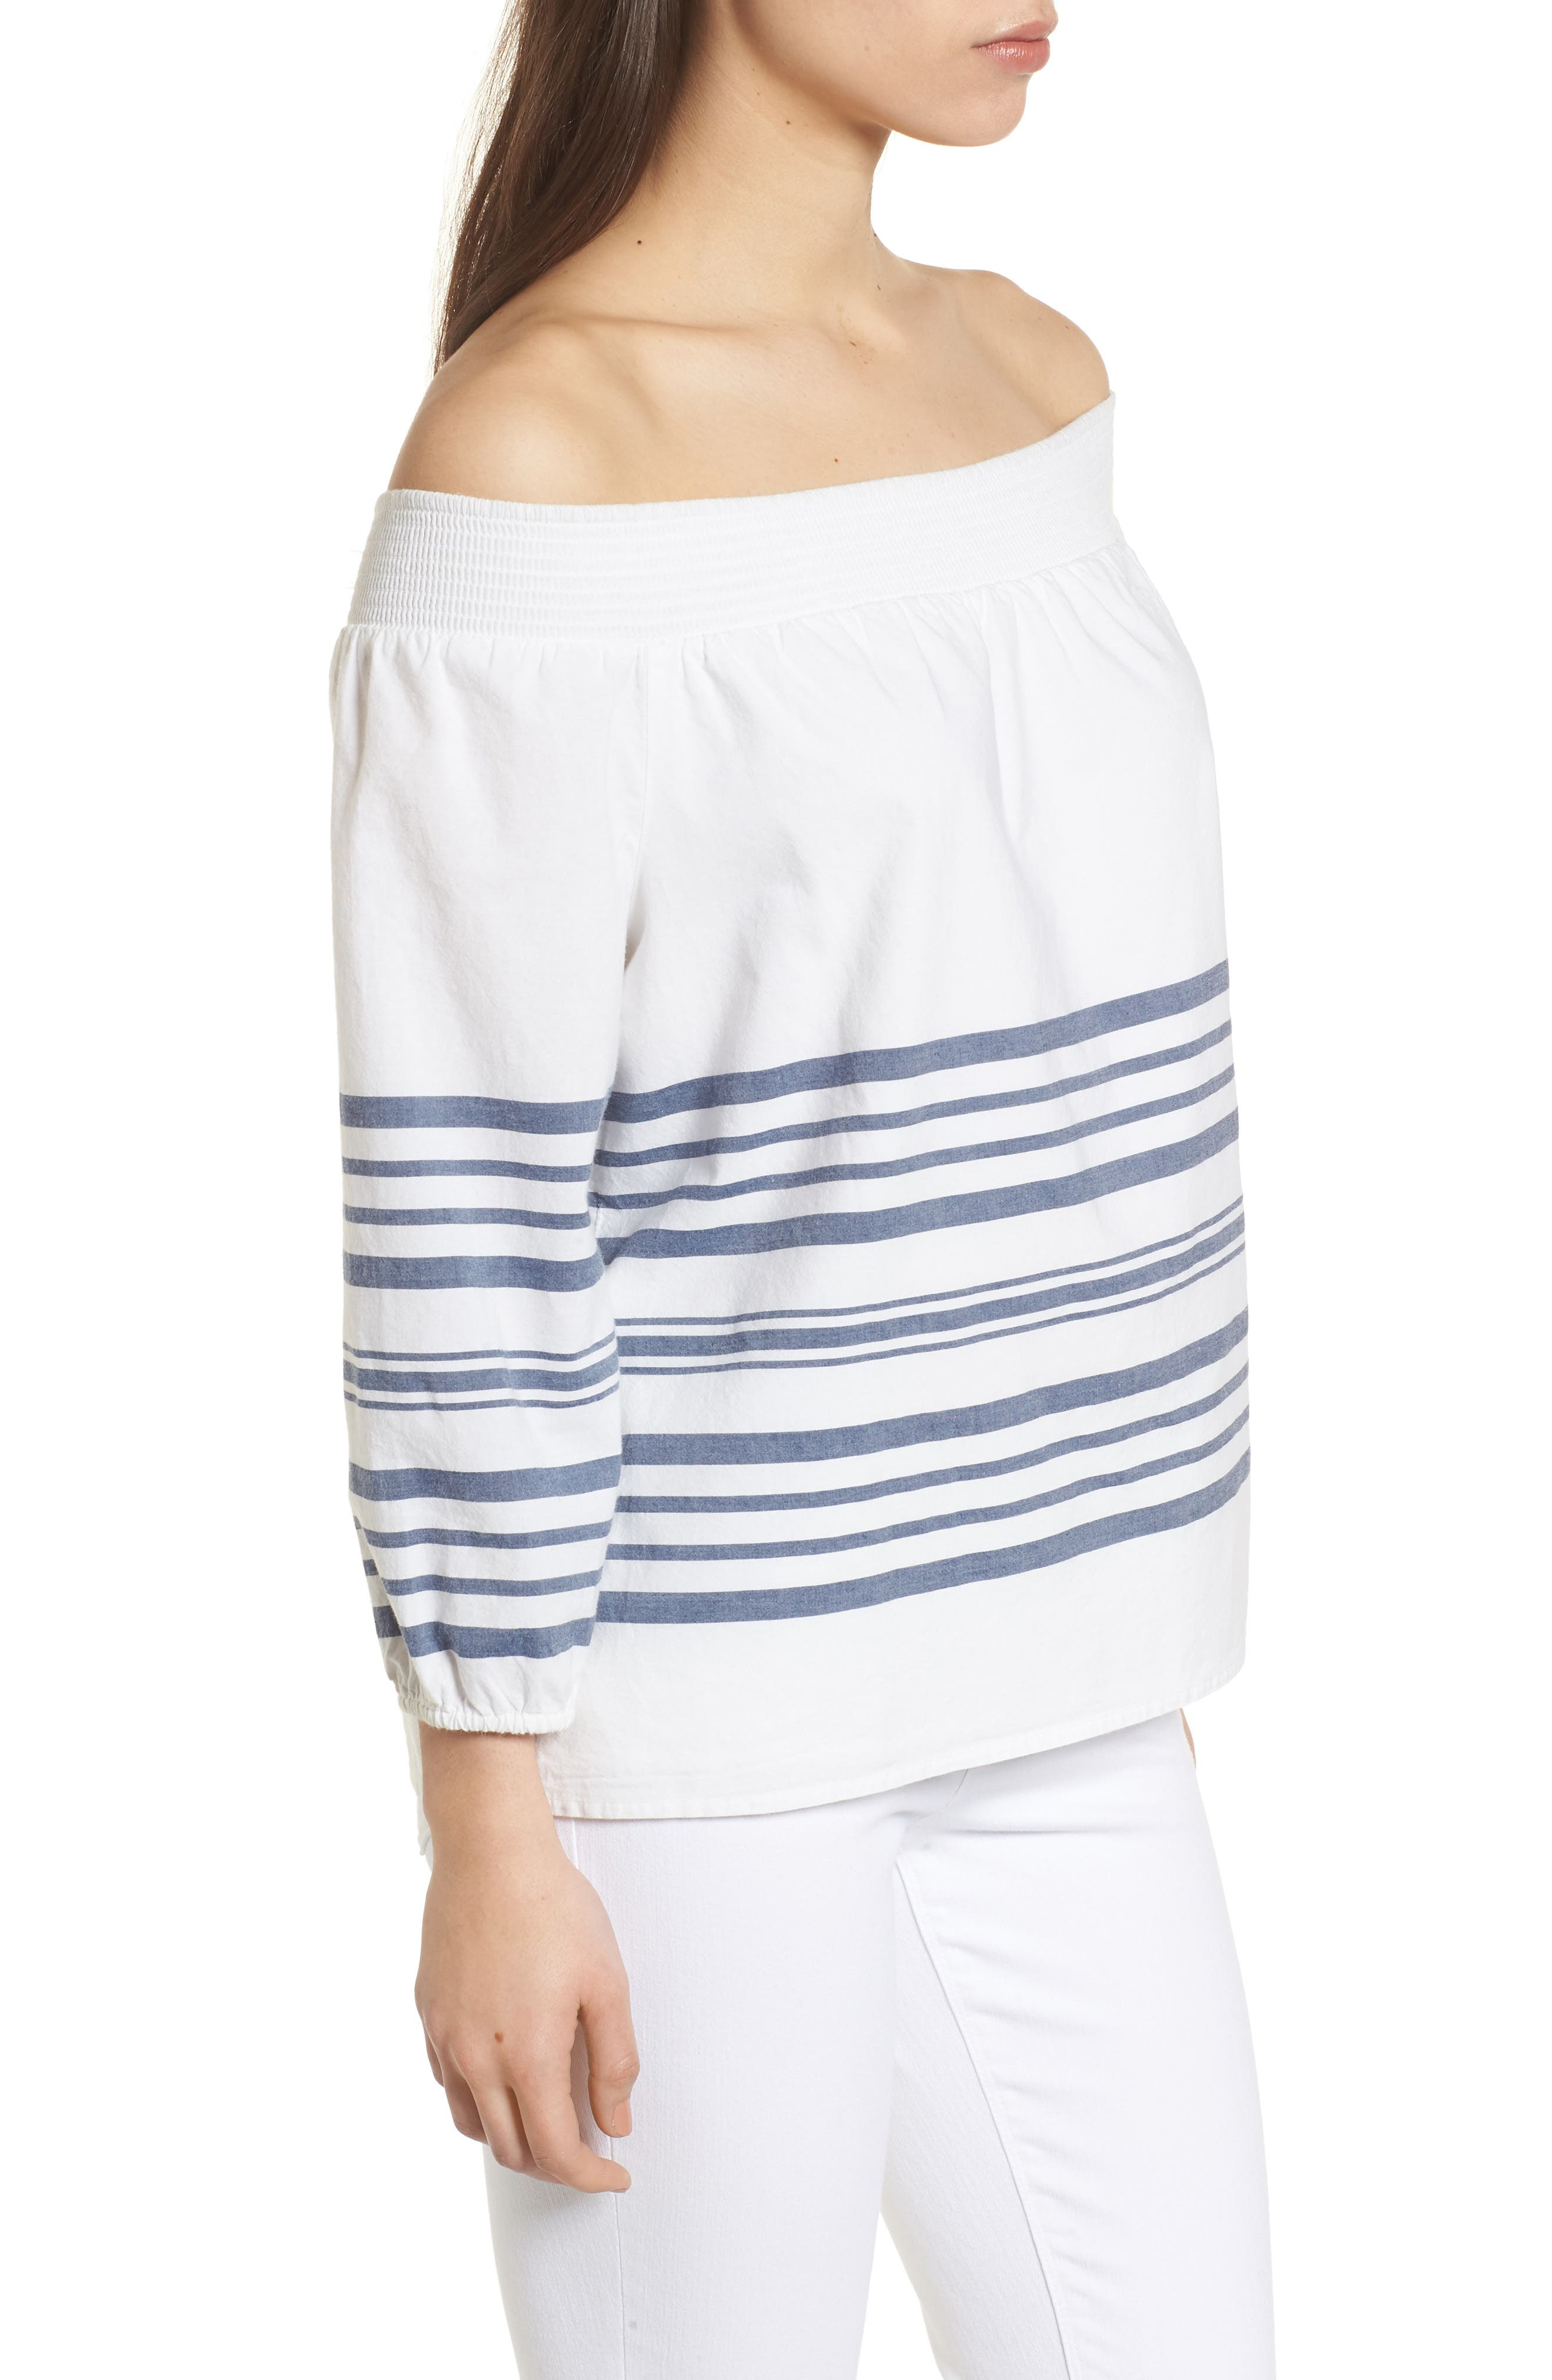 Breaker Stripe Off the Shoulder Cotton Top,                             Alternate thumbnail 3, color,                             100